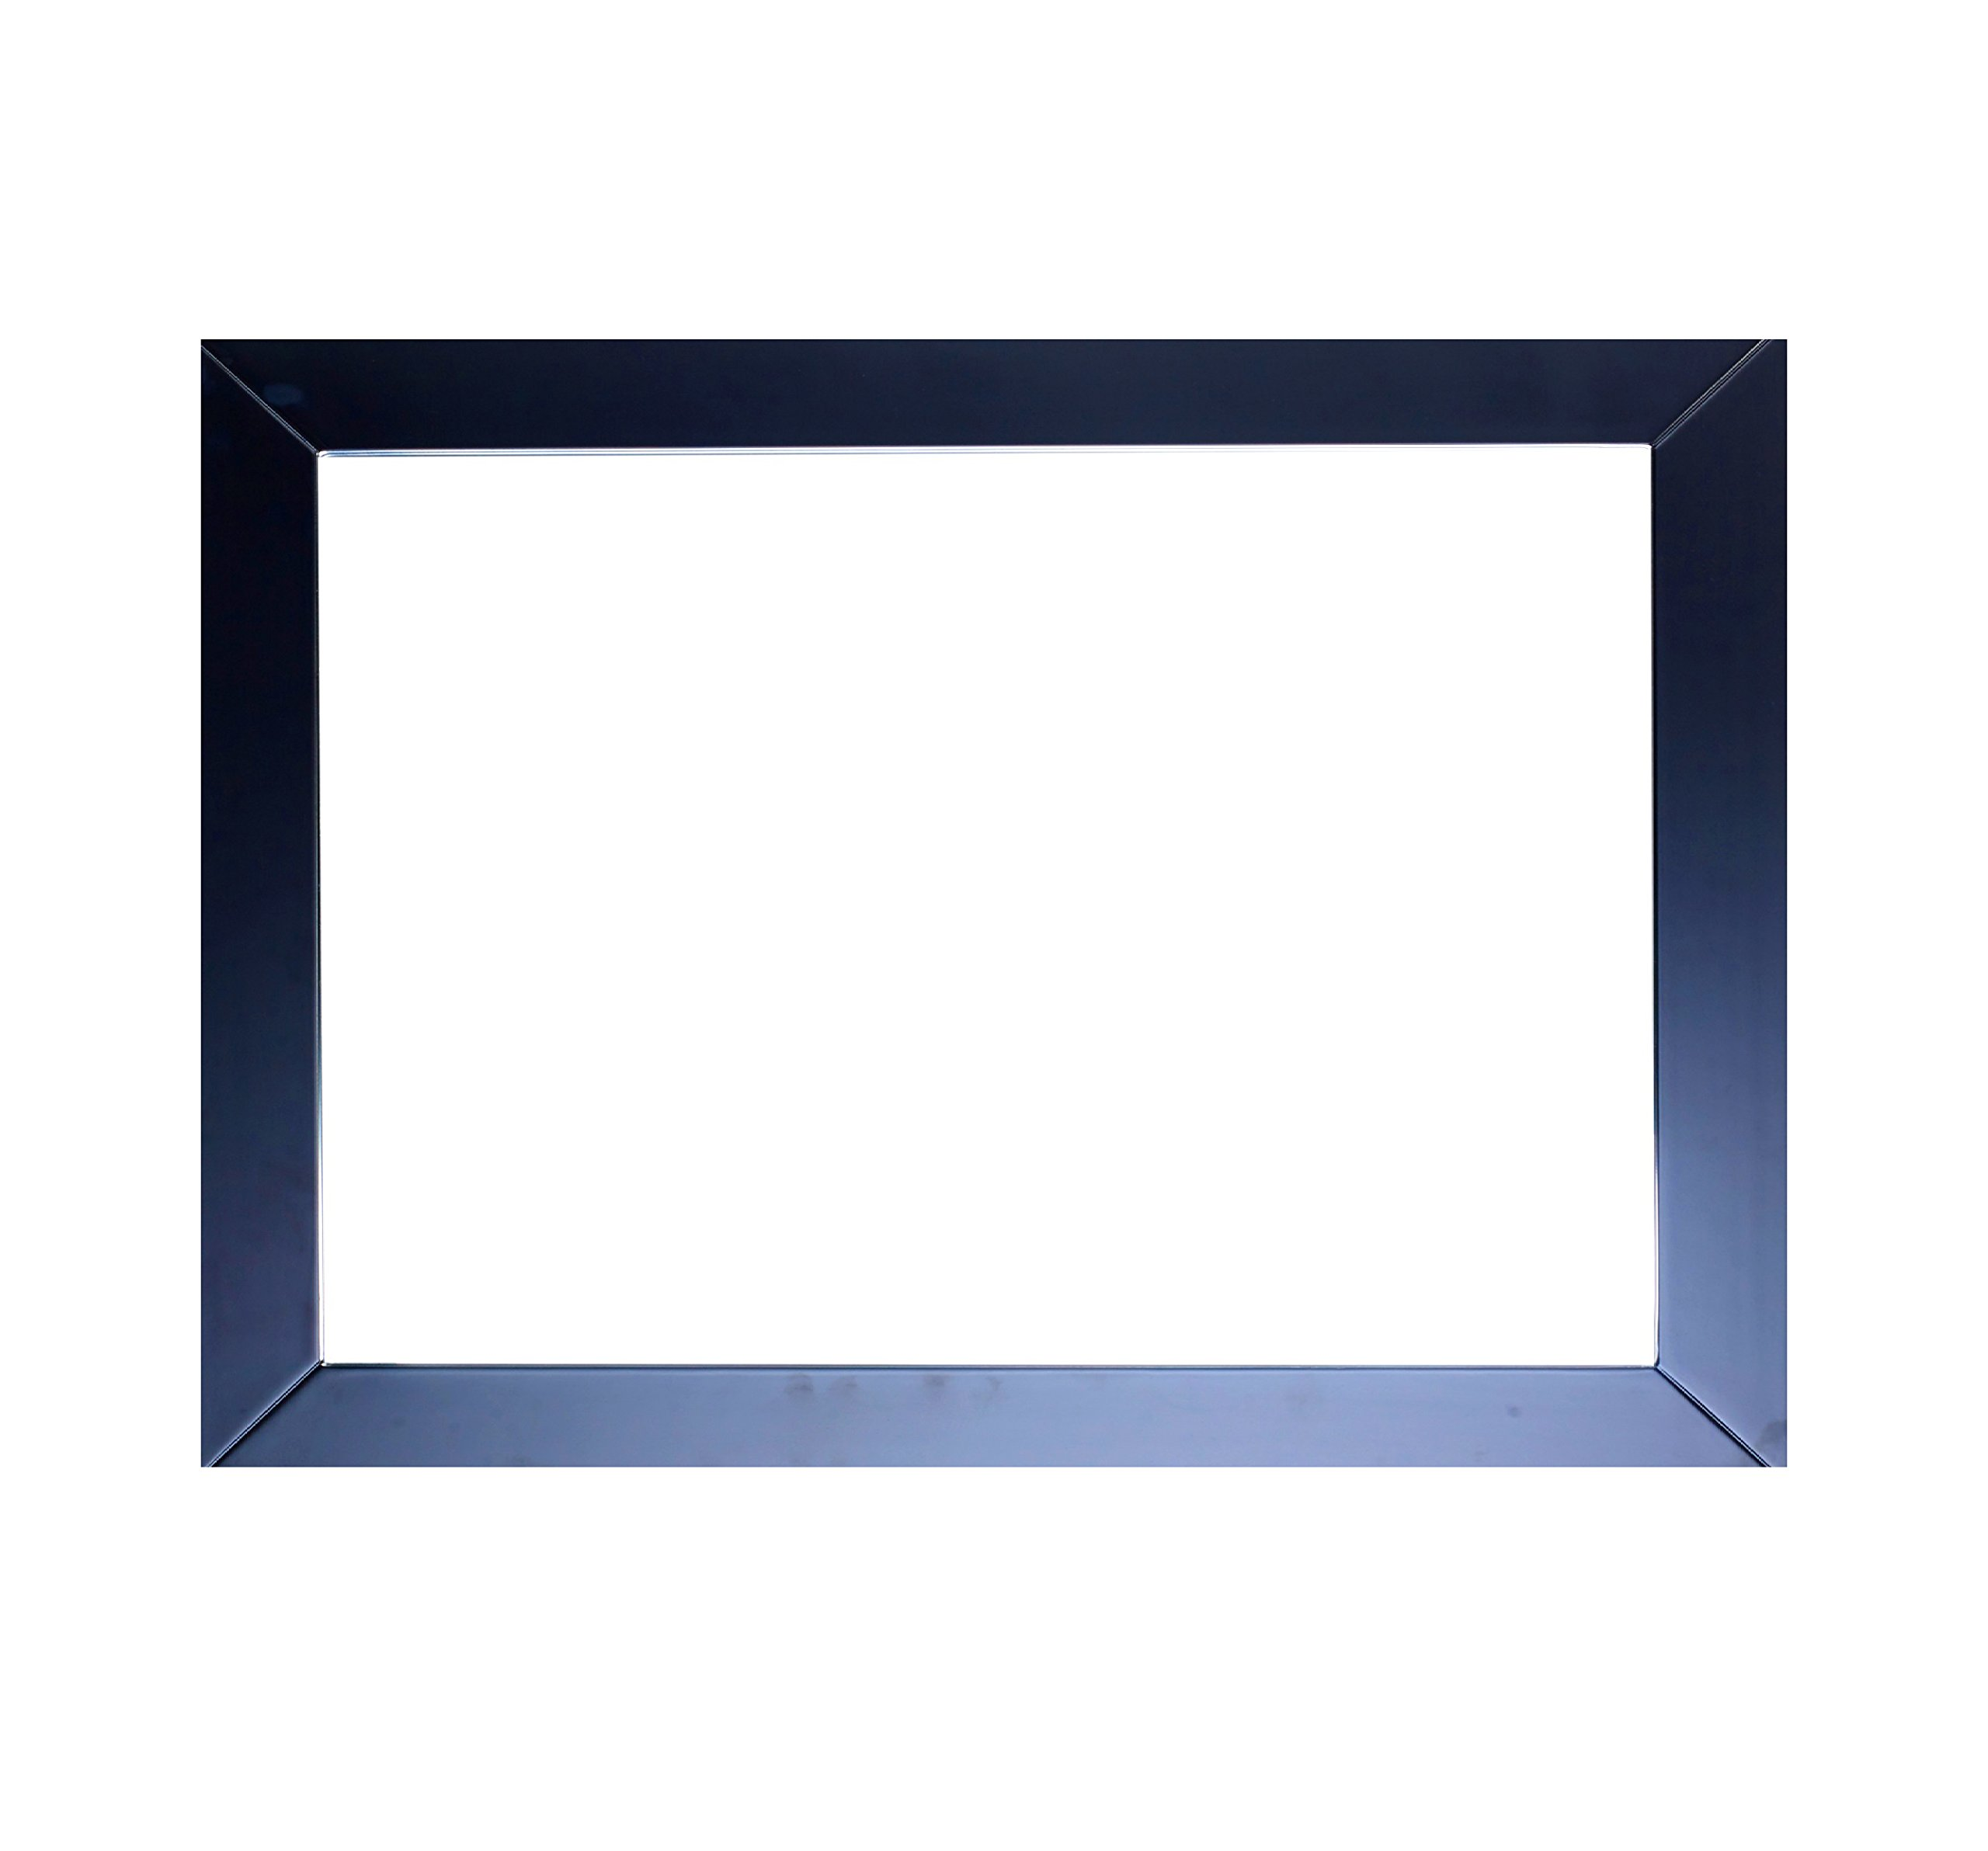 Eviva EVMR514-48X30-ES New York Bathroom Vanity Mirror Full Frame Espresso 48X31 Wall Mount Combination